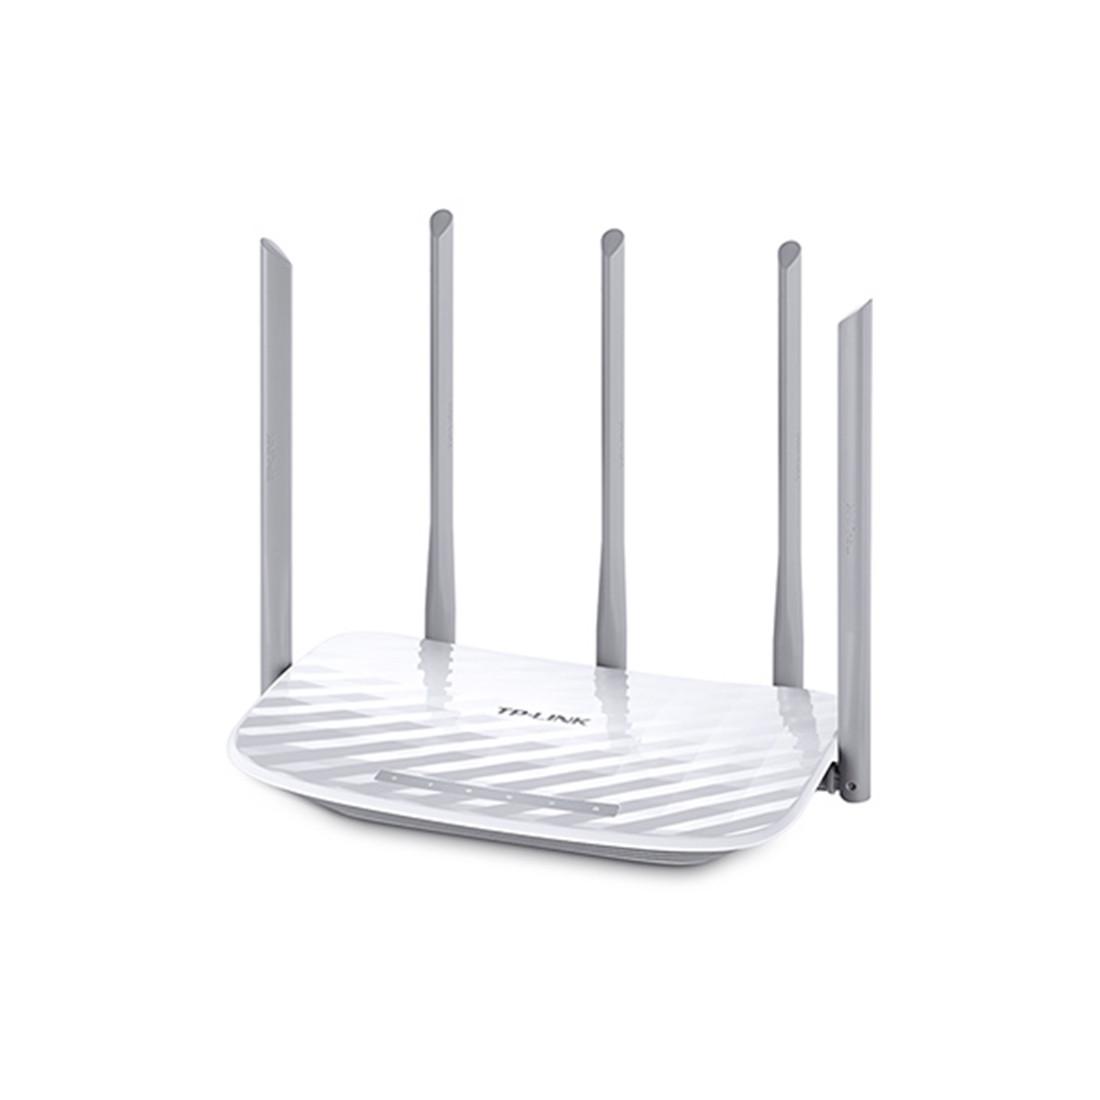 TP-Link Archer C60 Двухдиапазонный Wi-Fi роутер AC1350